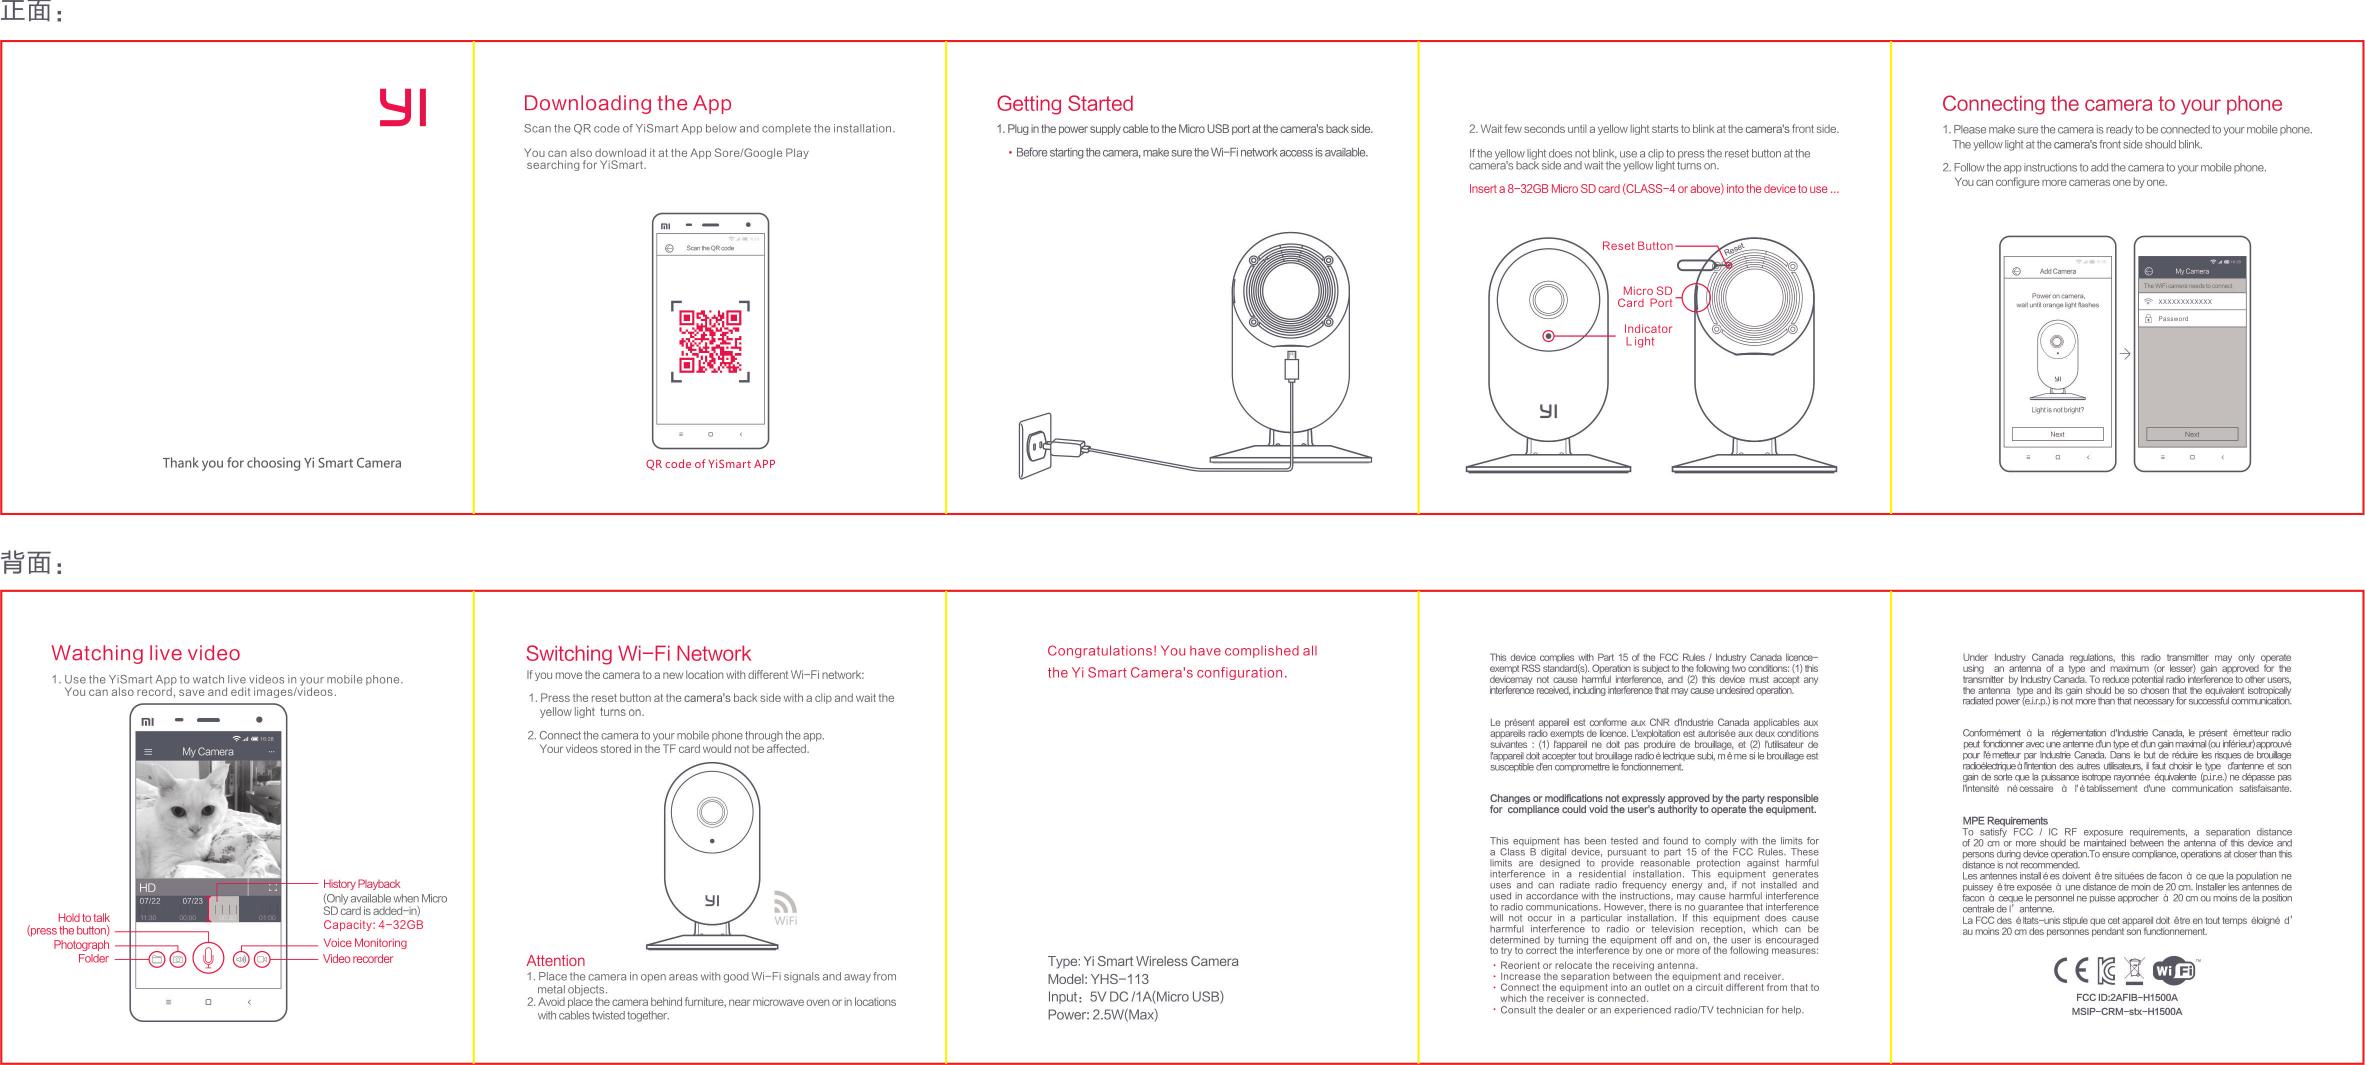 Xiaoyi Technology H1500a Yhs 113 Ir Smart Wireless Camera User Diagram Manual Guide